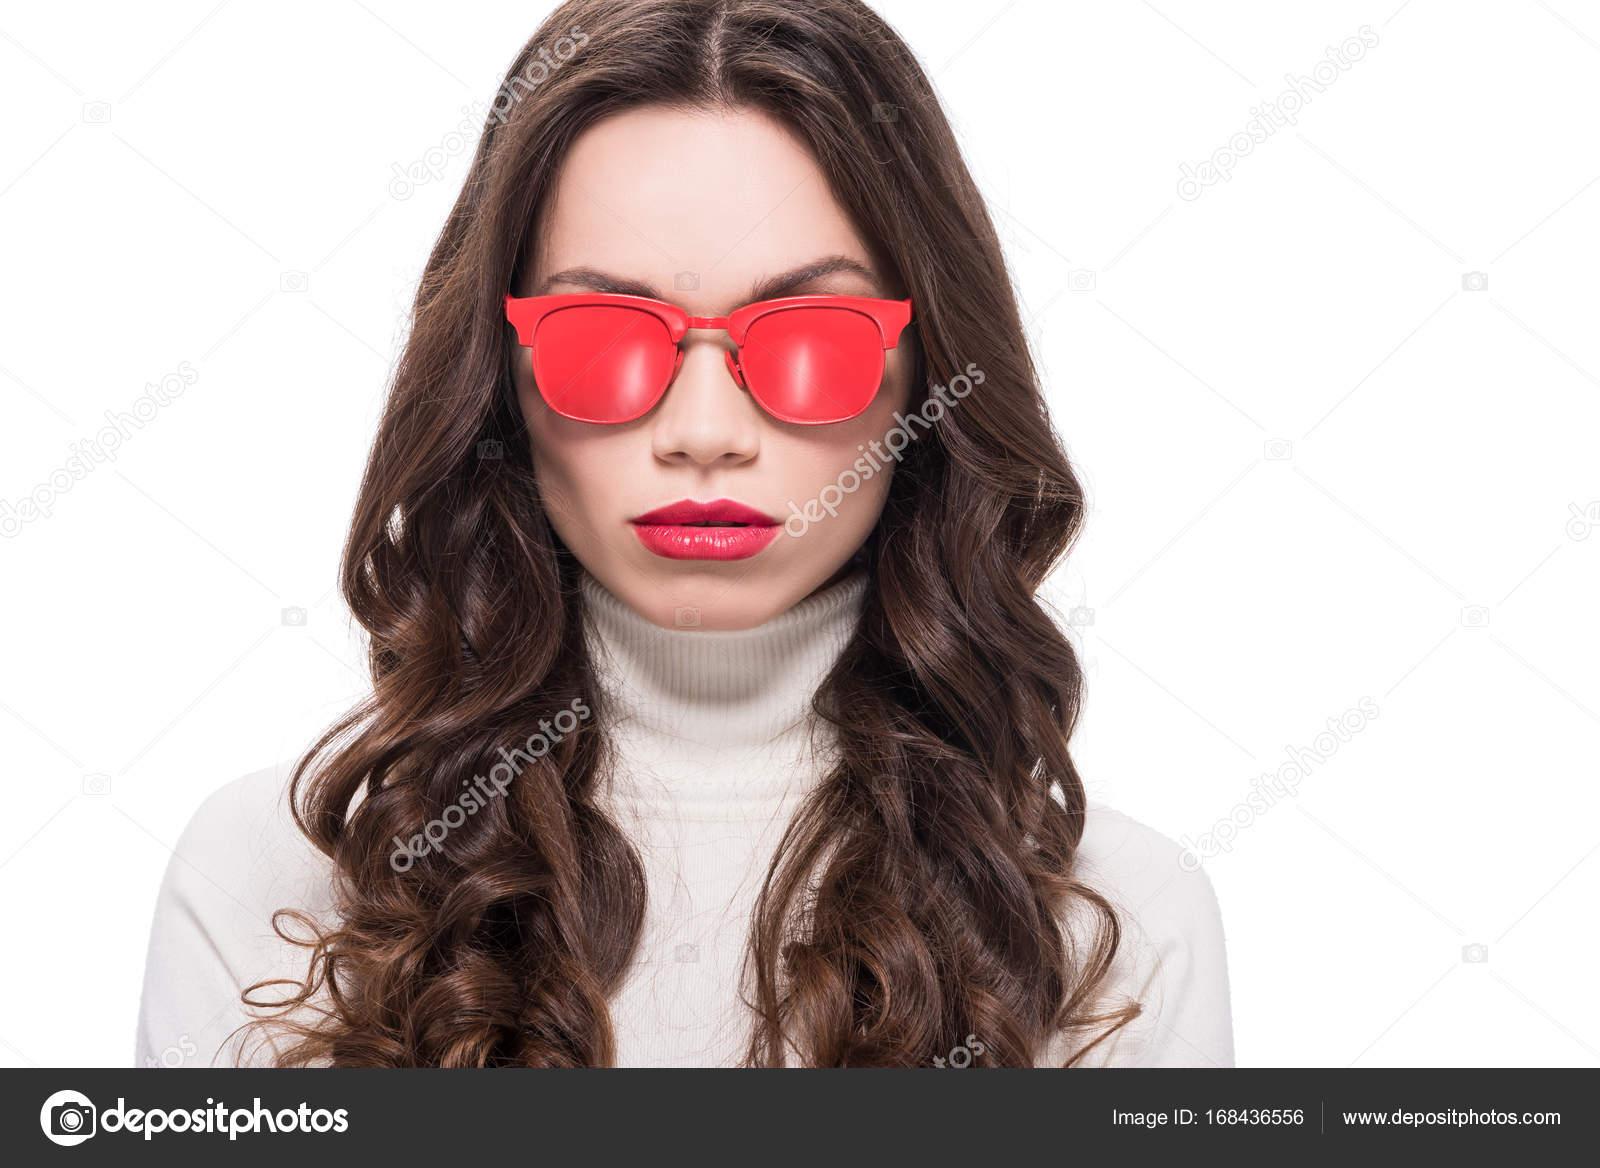 1bdc99c7c5516 mulher óculos de sol vermelho — Stock Photo © VitalikRadko  168436556